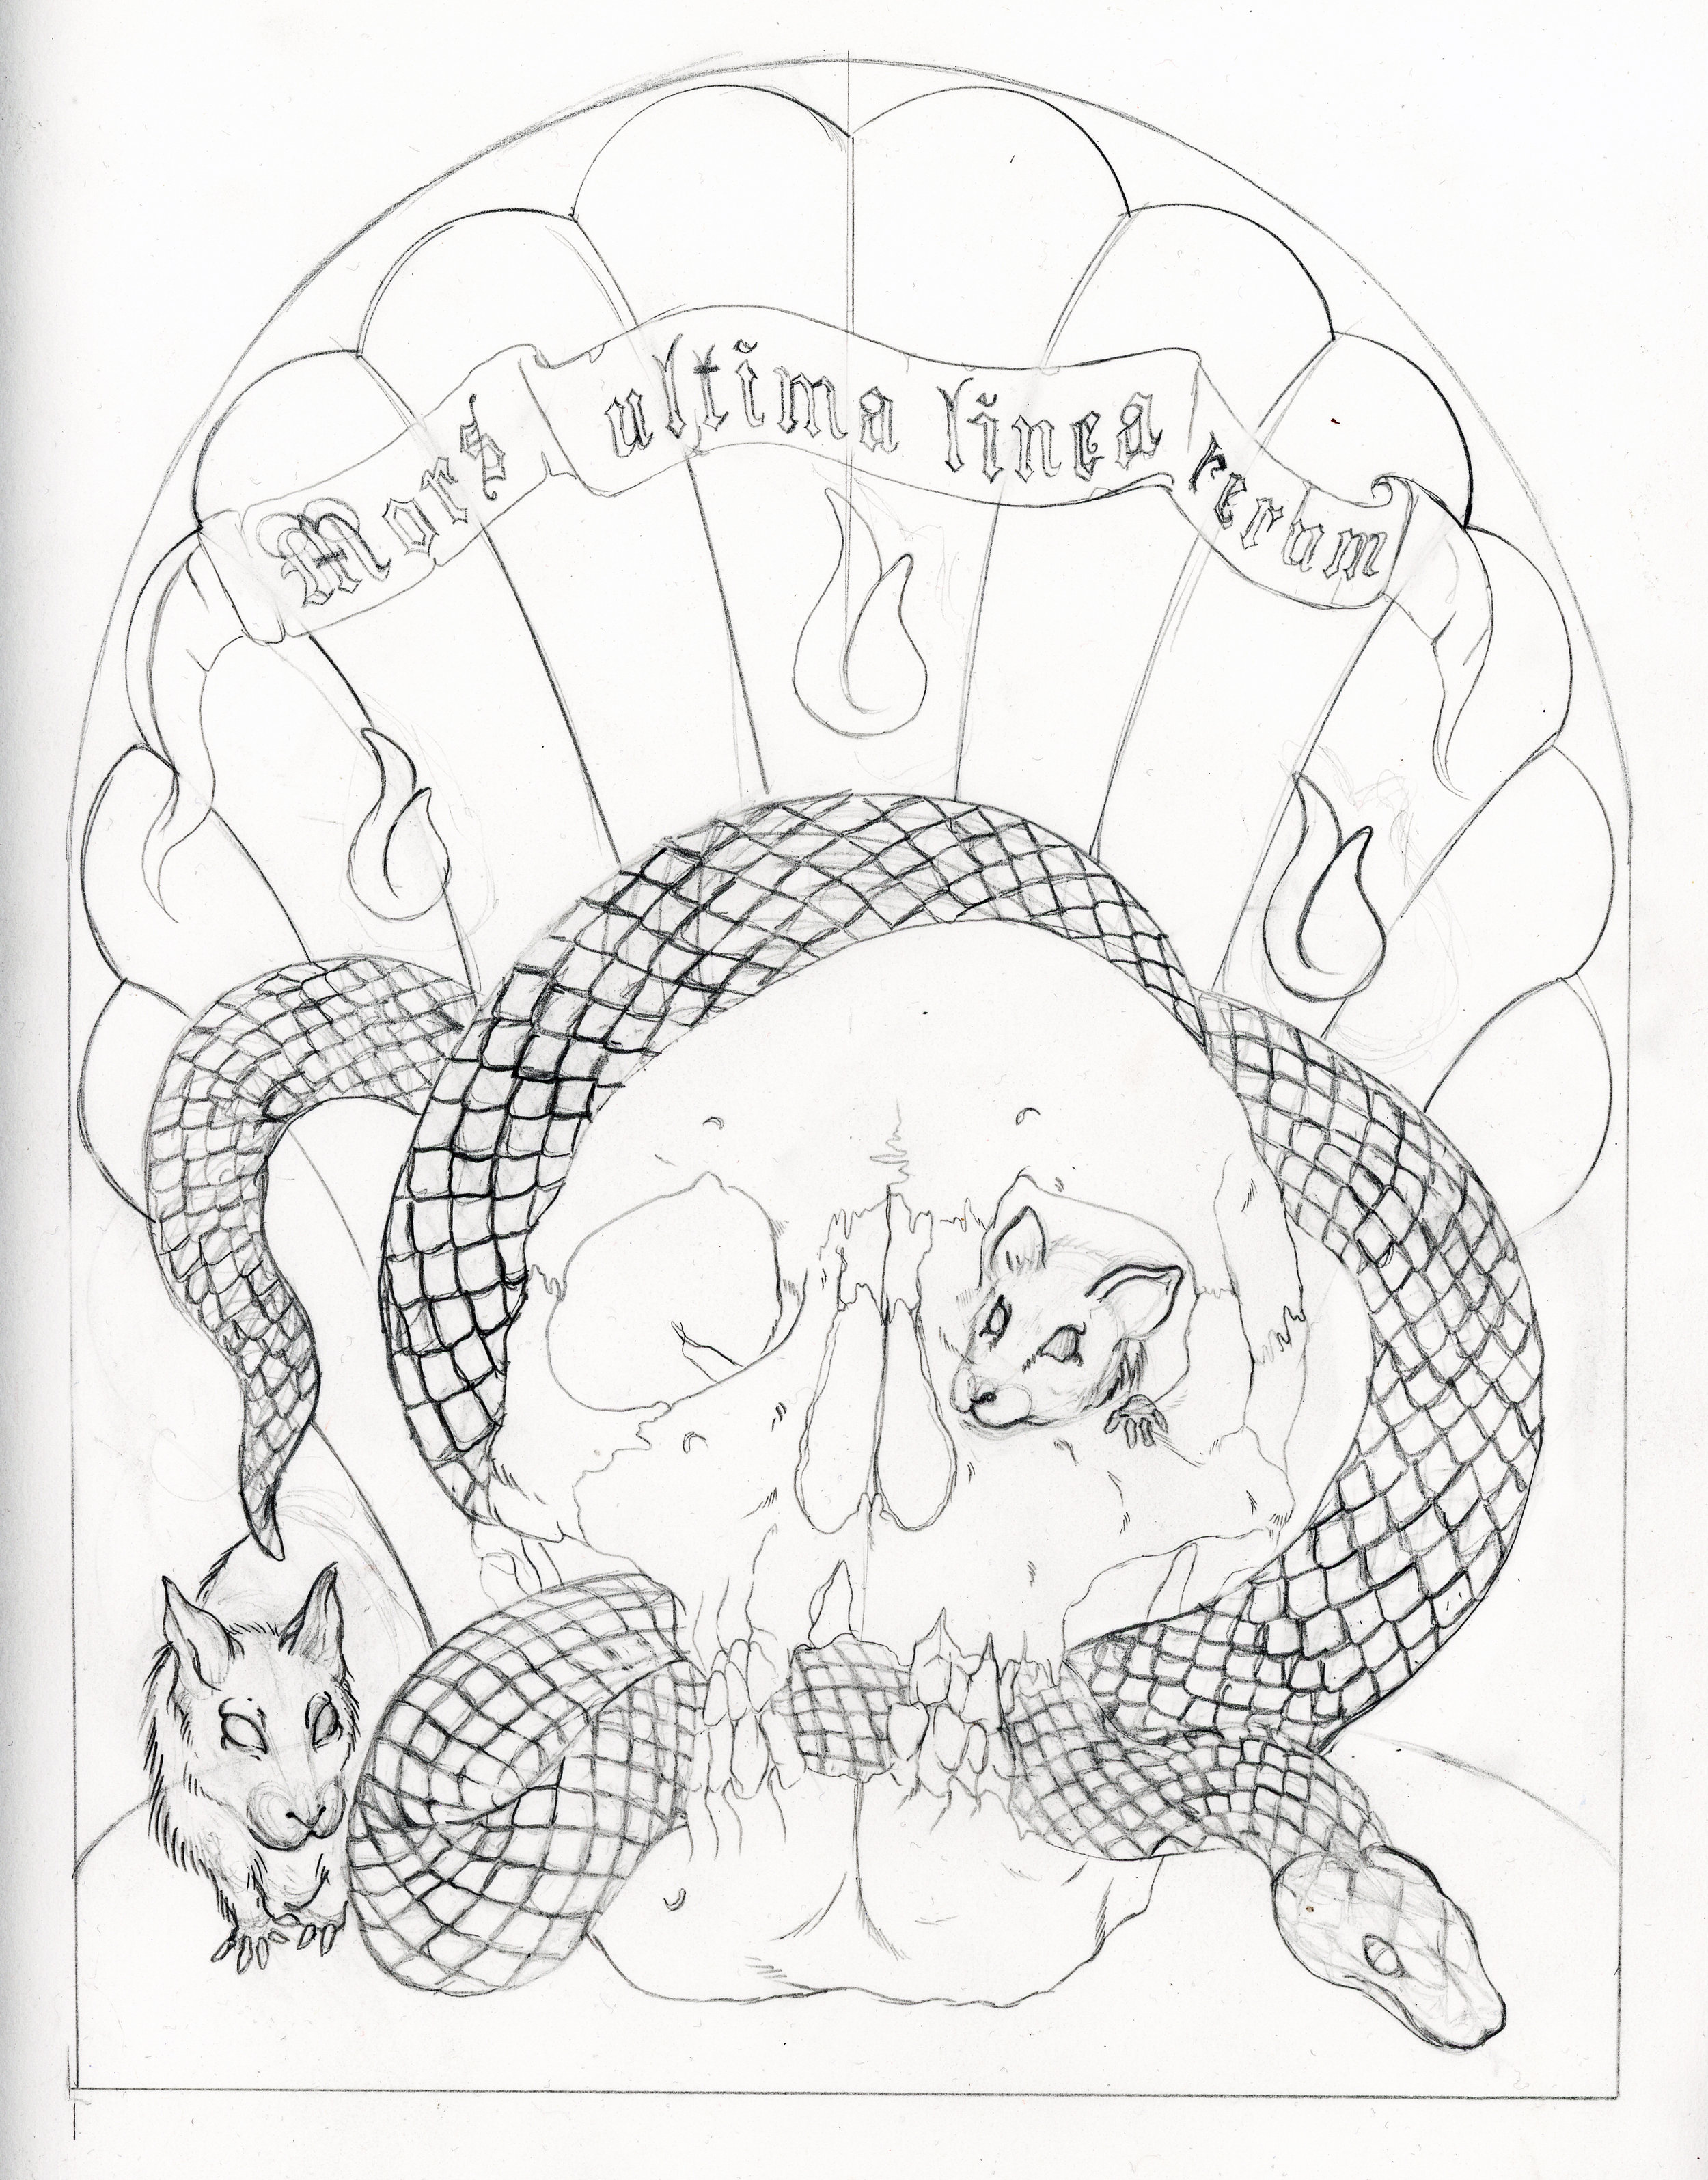 Mors ultima linea rerum sketch.jpg